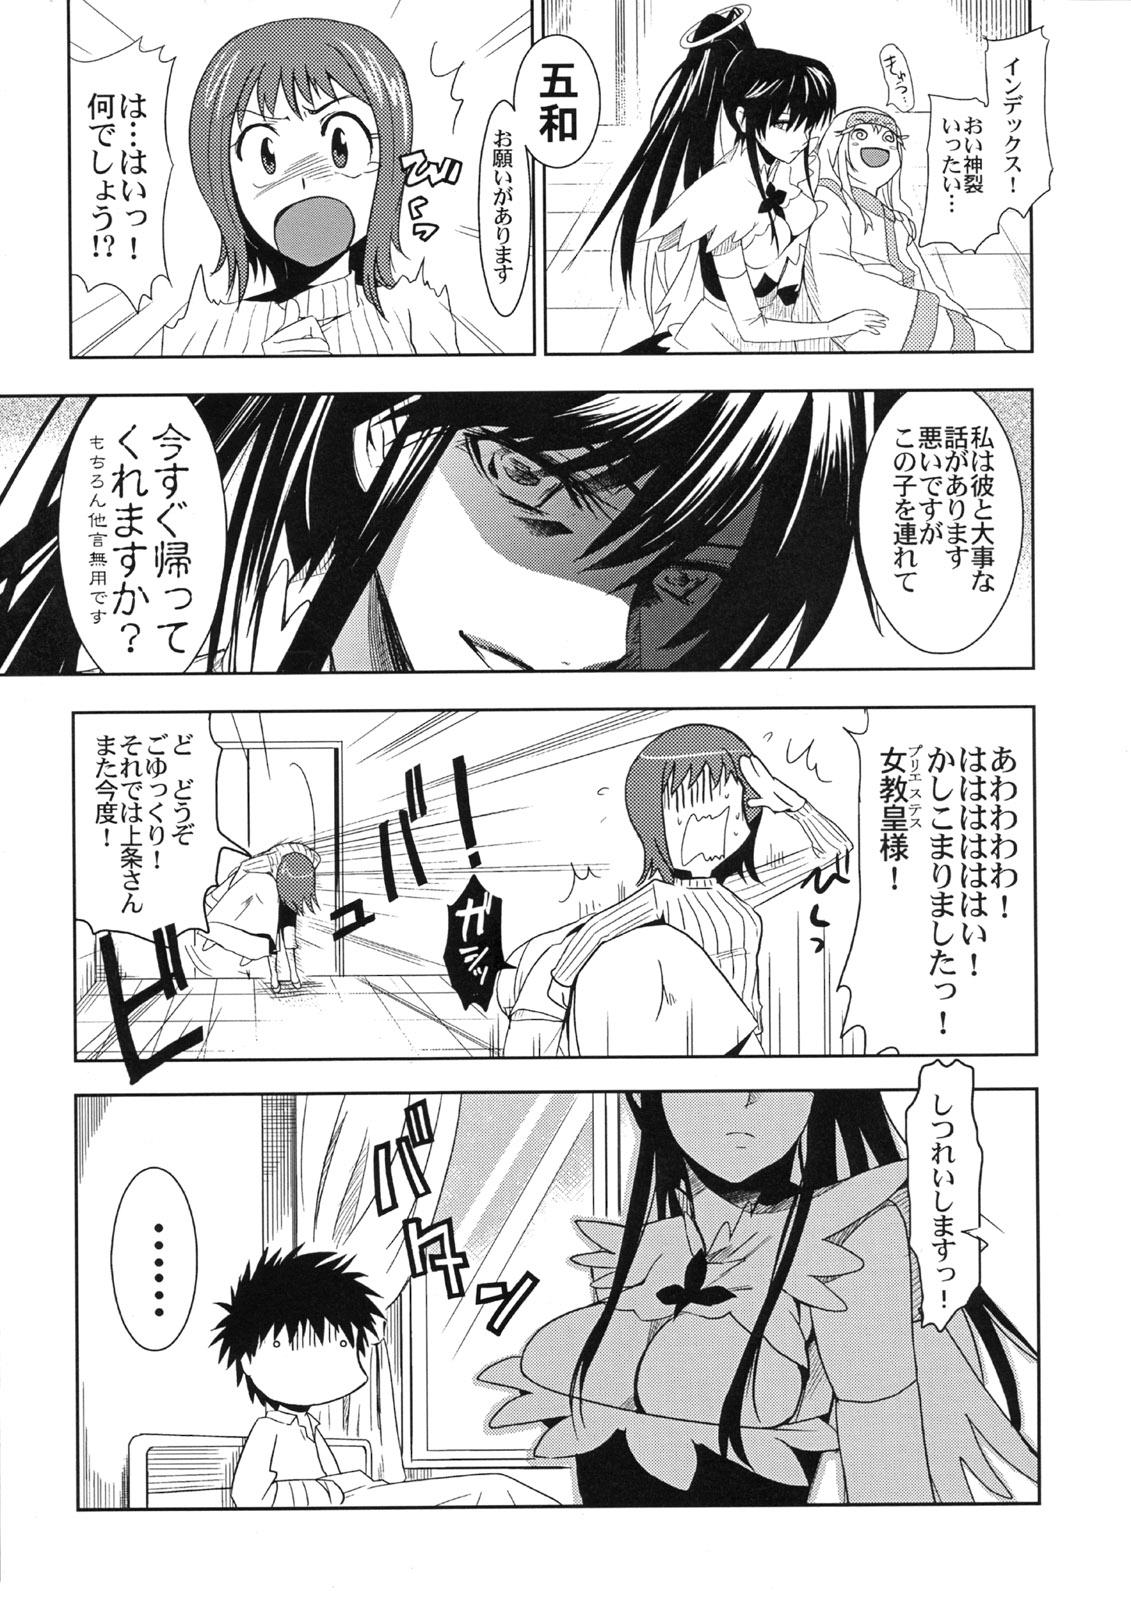 majutsu maou to iseka no dorei shouju shoukan How to use bandit clash royale